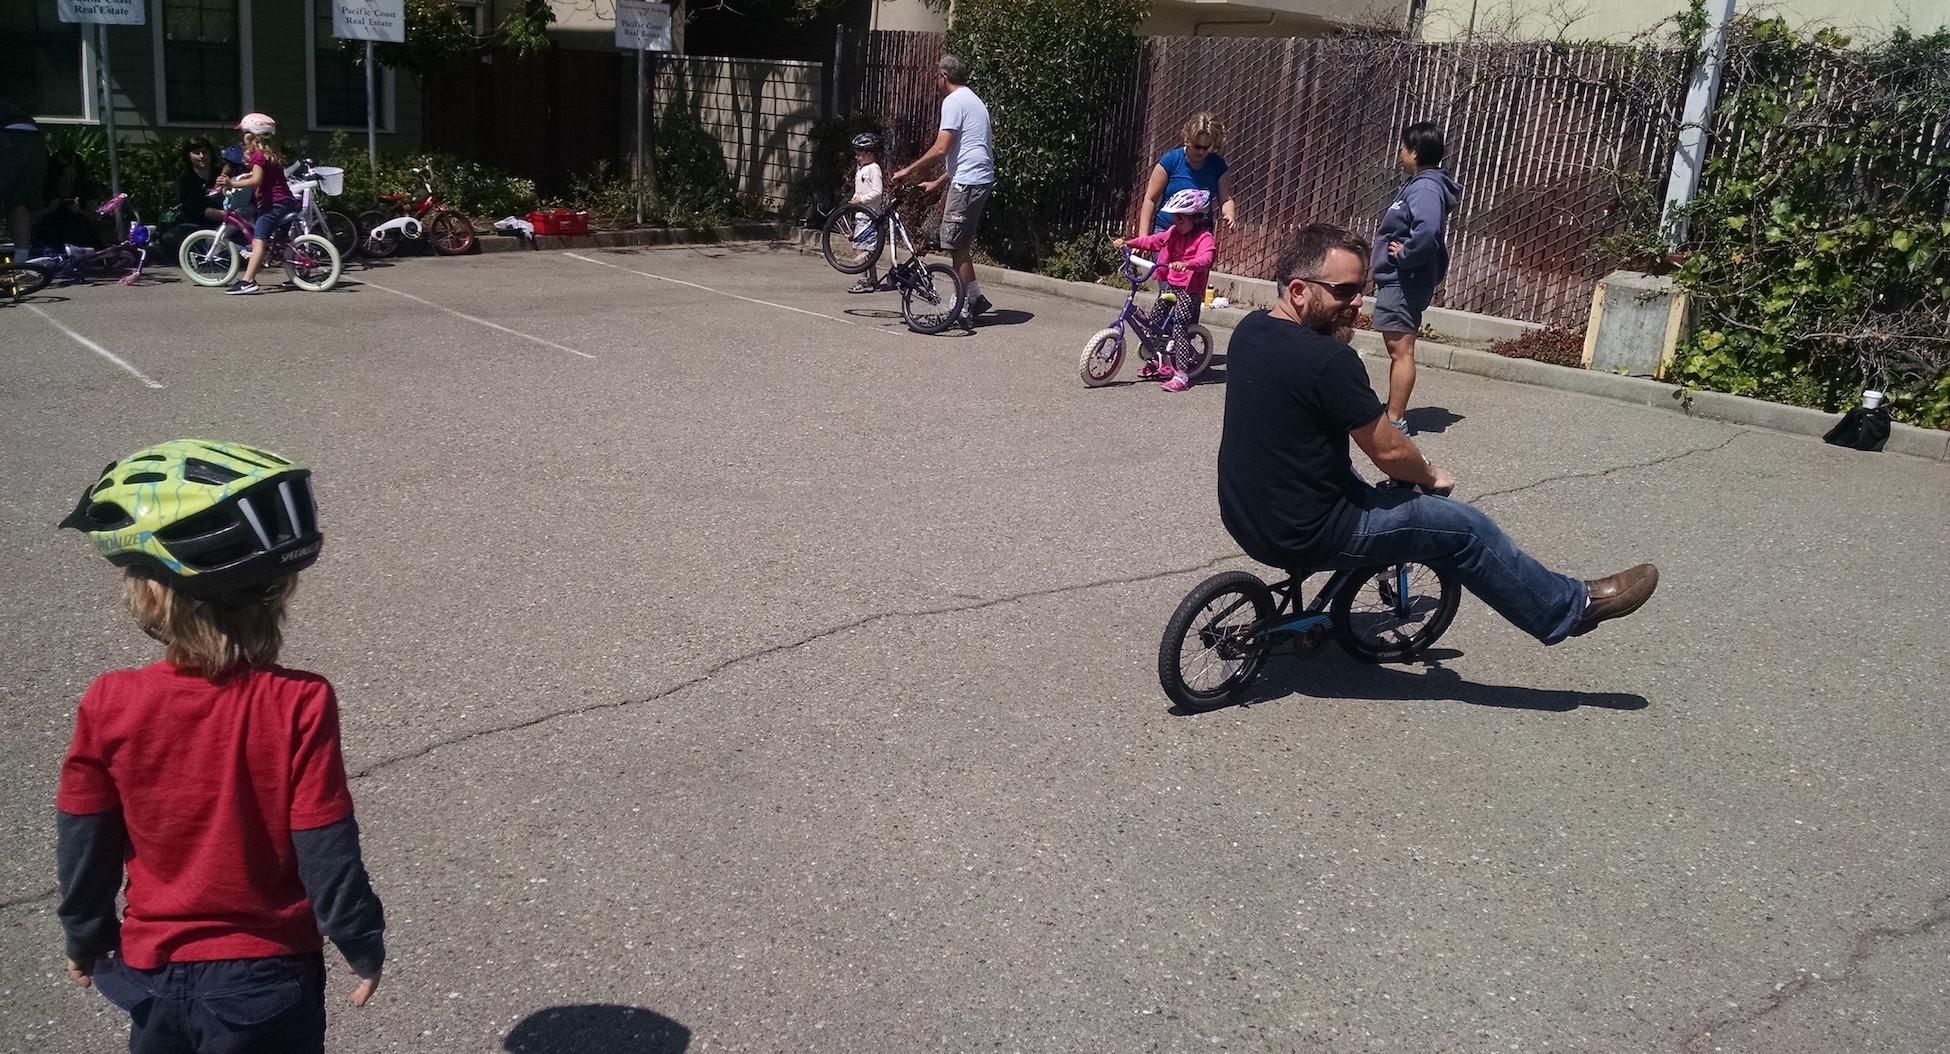 Adult riding a kid's bike